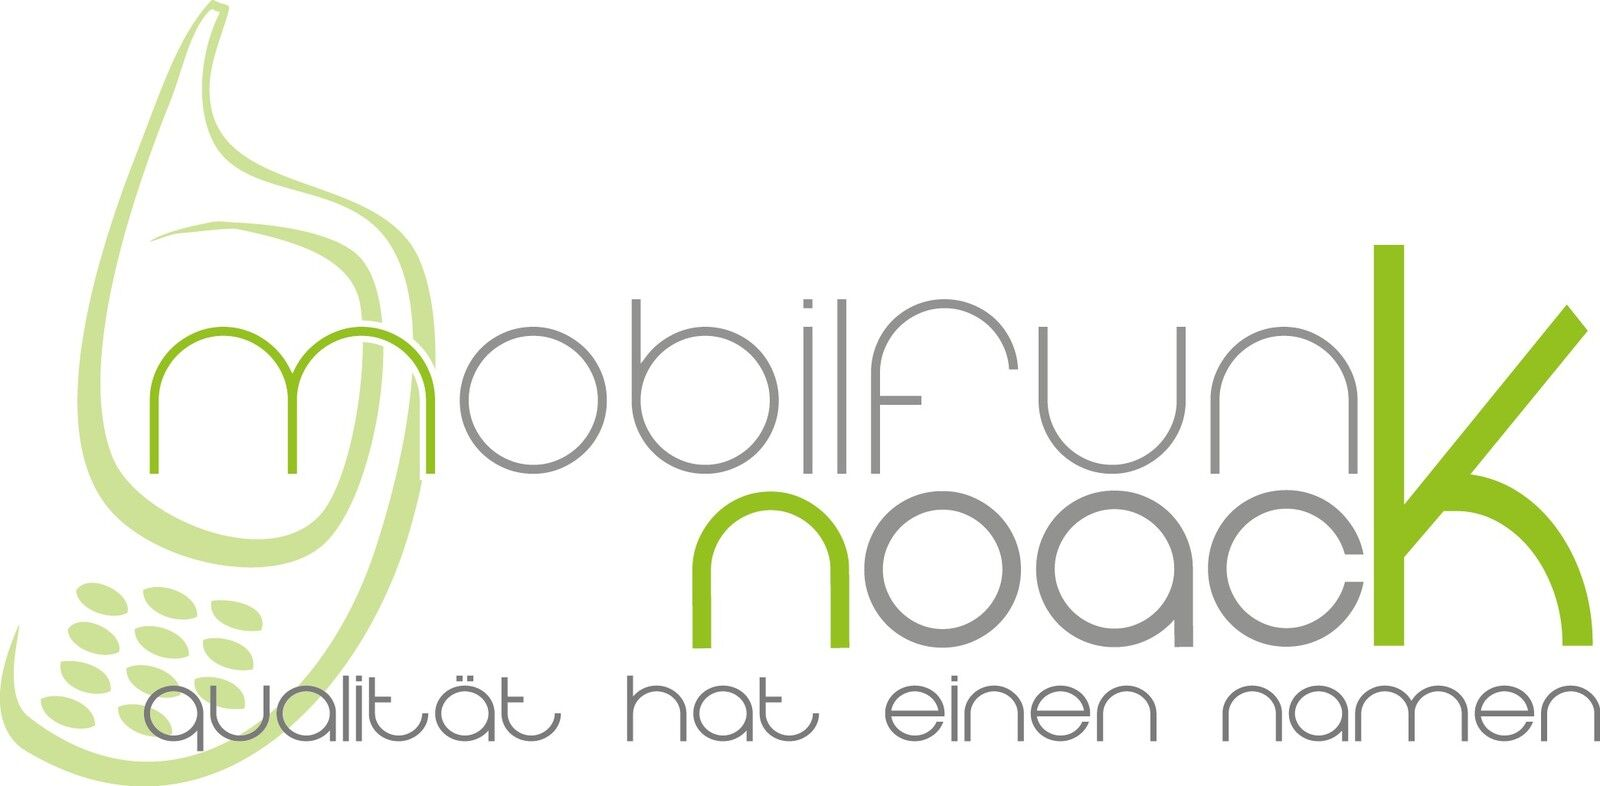 Mobilfunk Noack